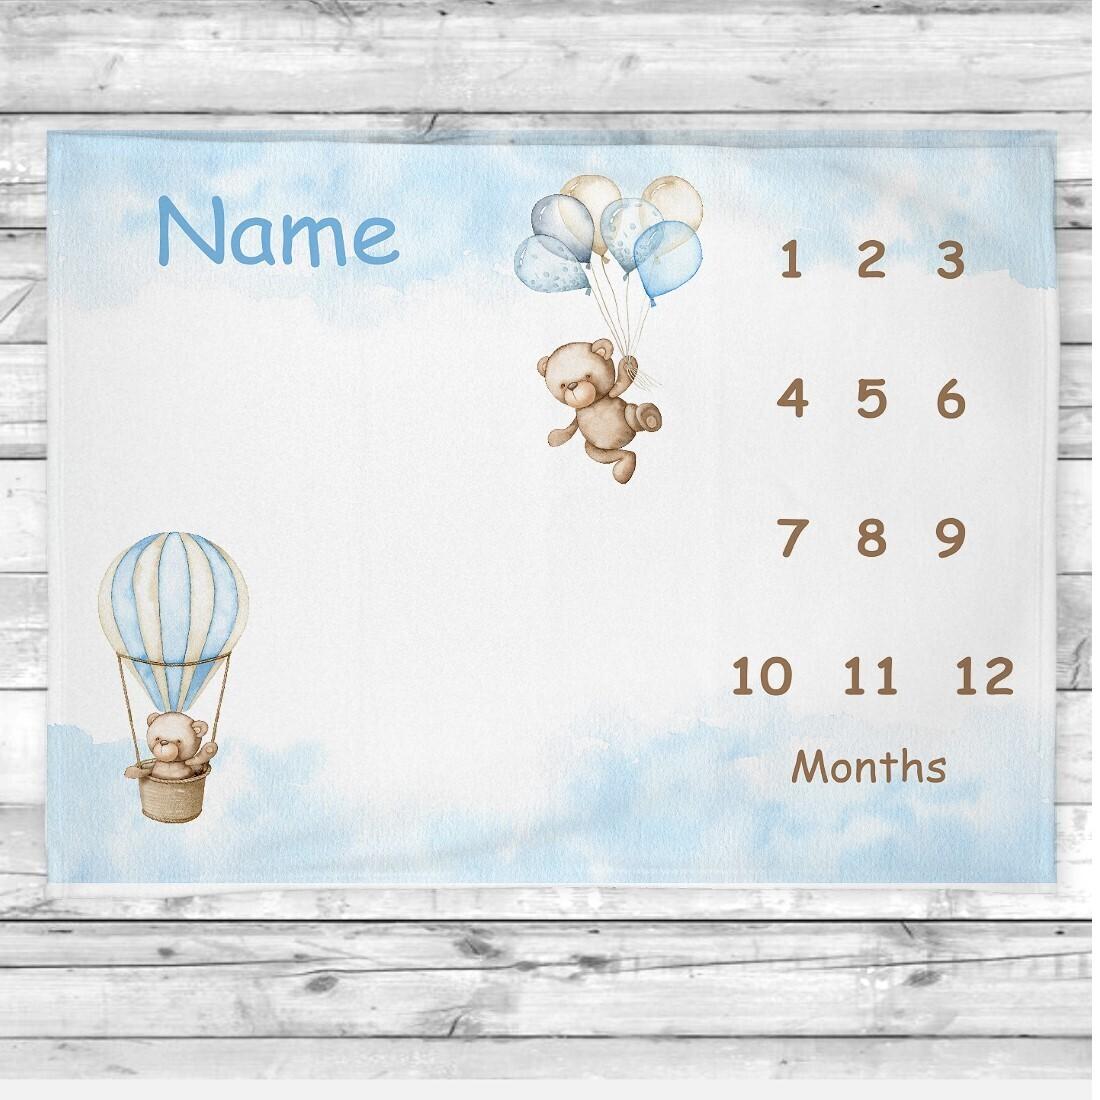 Baby Boy Milestone Blanket Teddy Bears Baby Nursery Decor Month  New Baby Shower Gift Baby Photo Op Backdrop